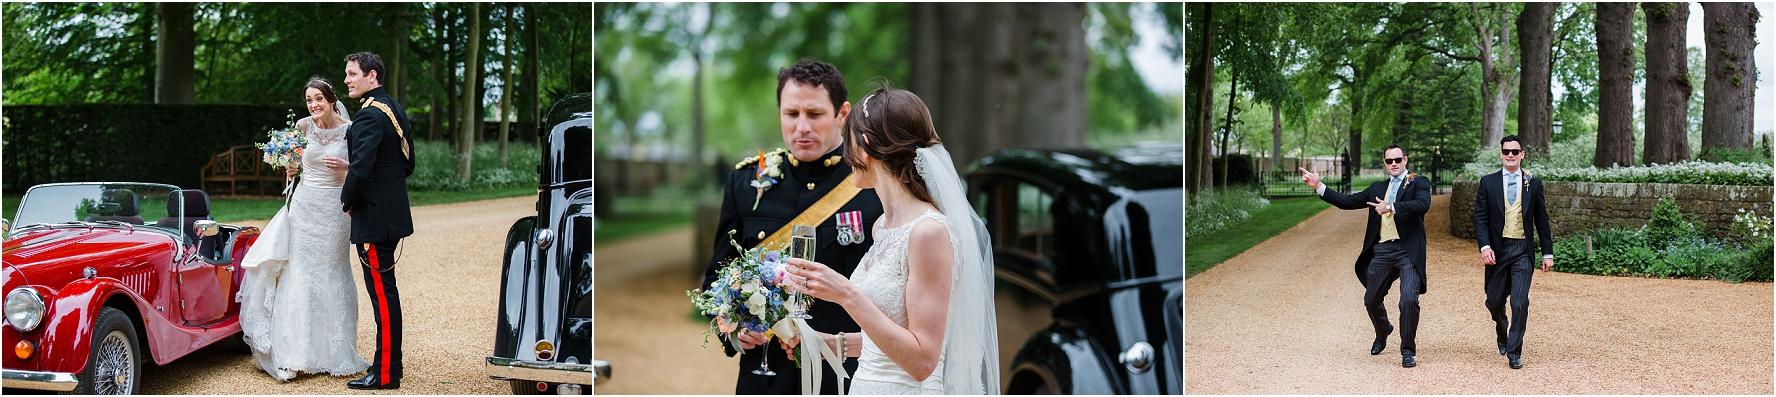 Wedding Photography The Orangery Settringham_0251